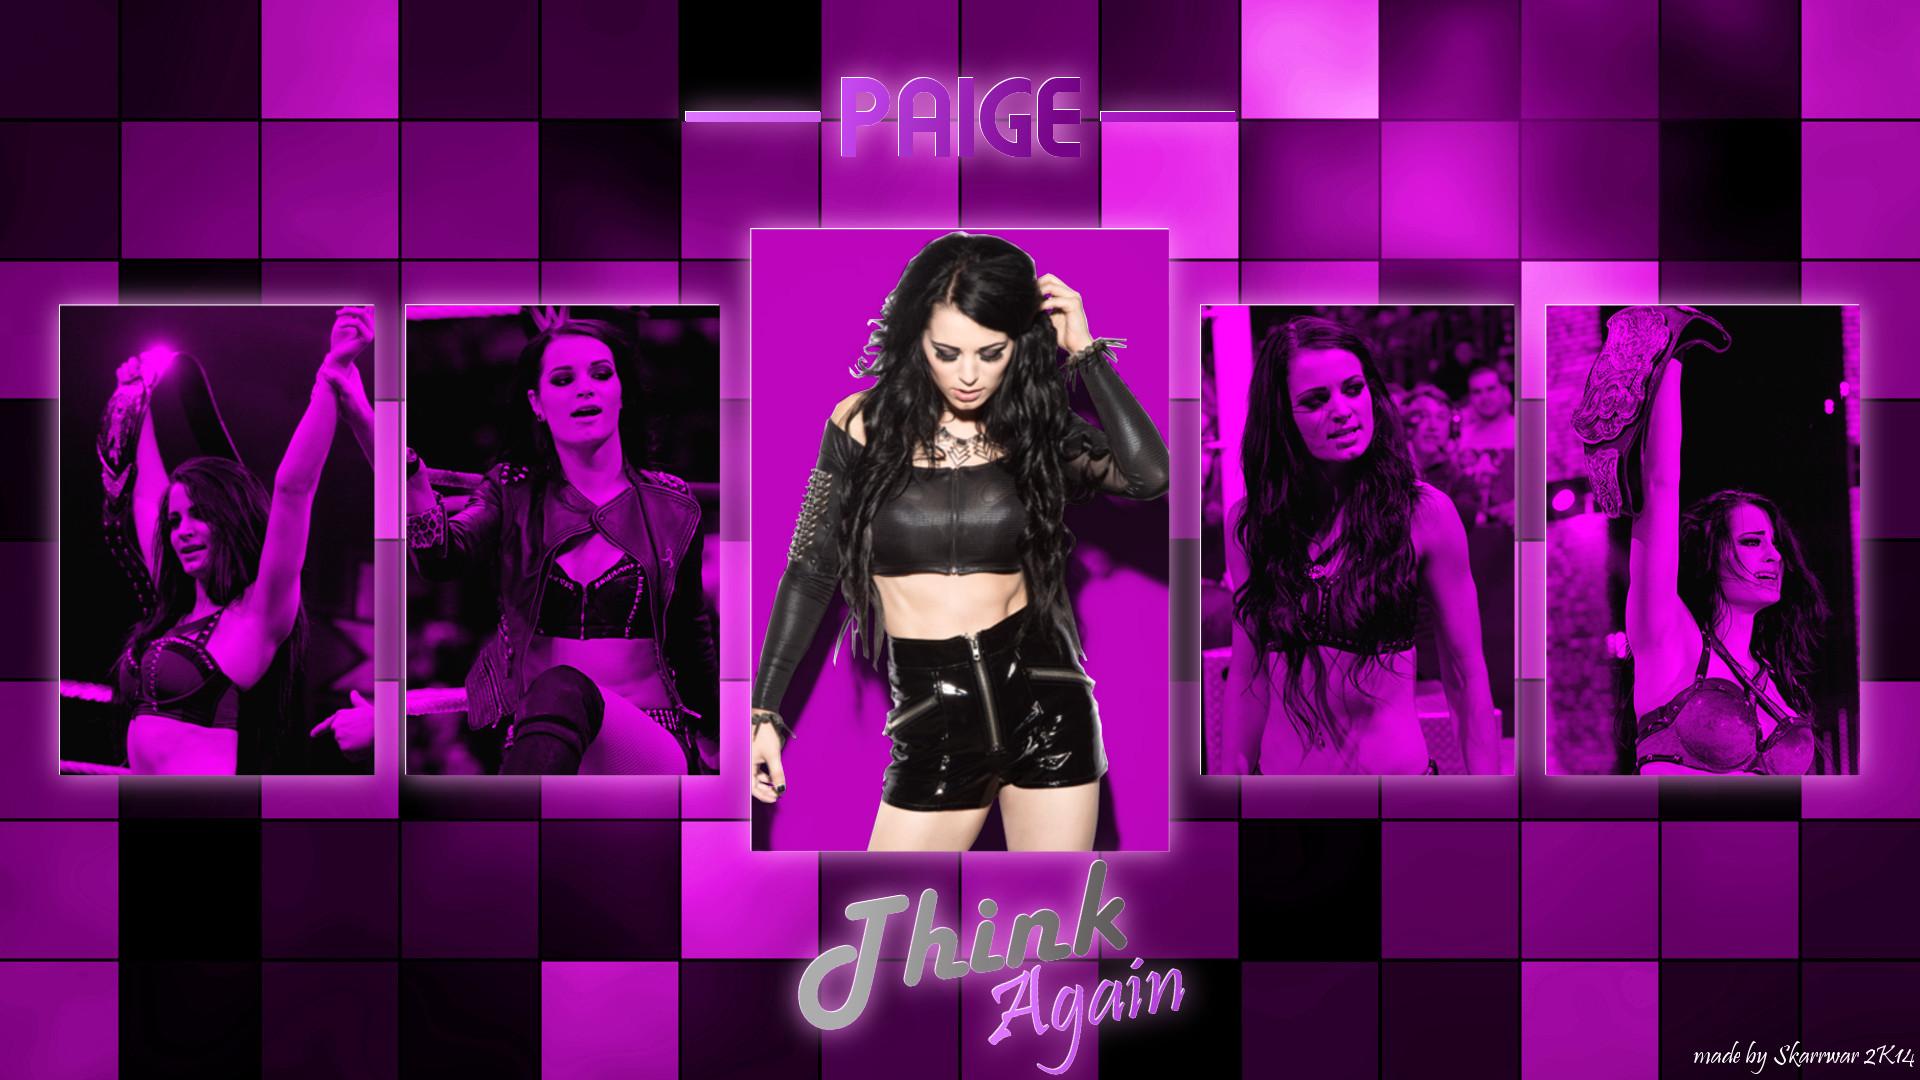 … Paige – Think Again Wallpaper by SkarrDWar